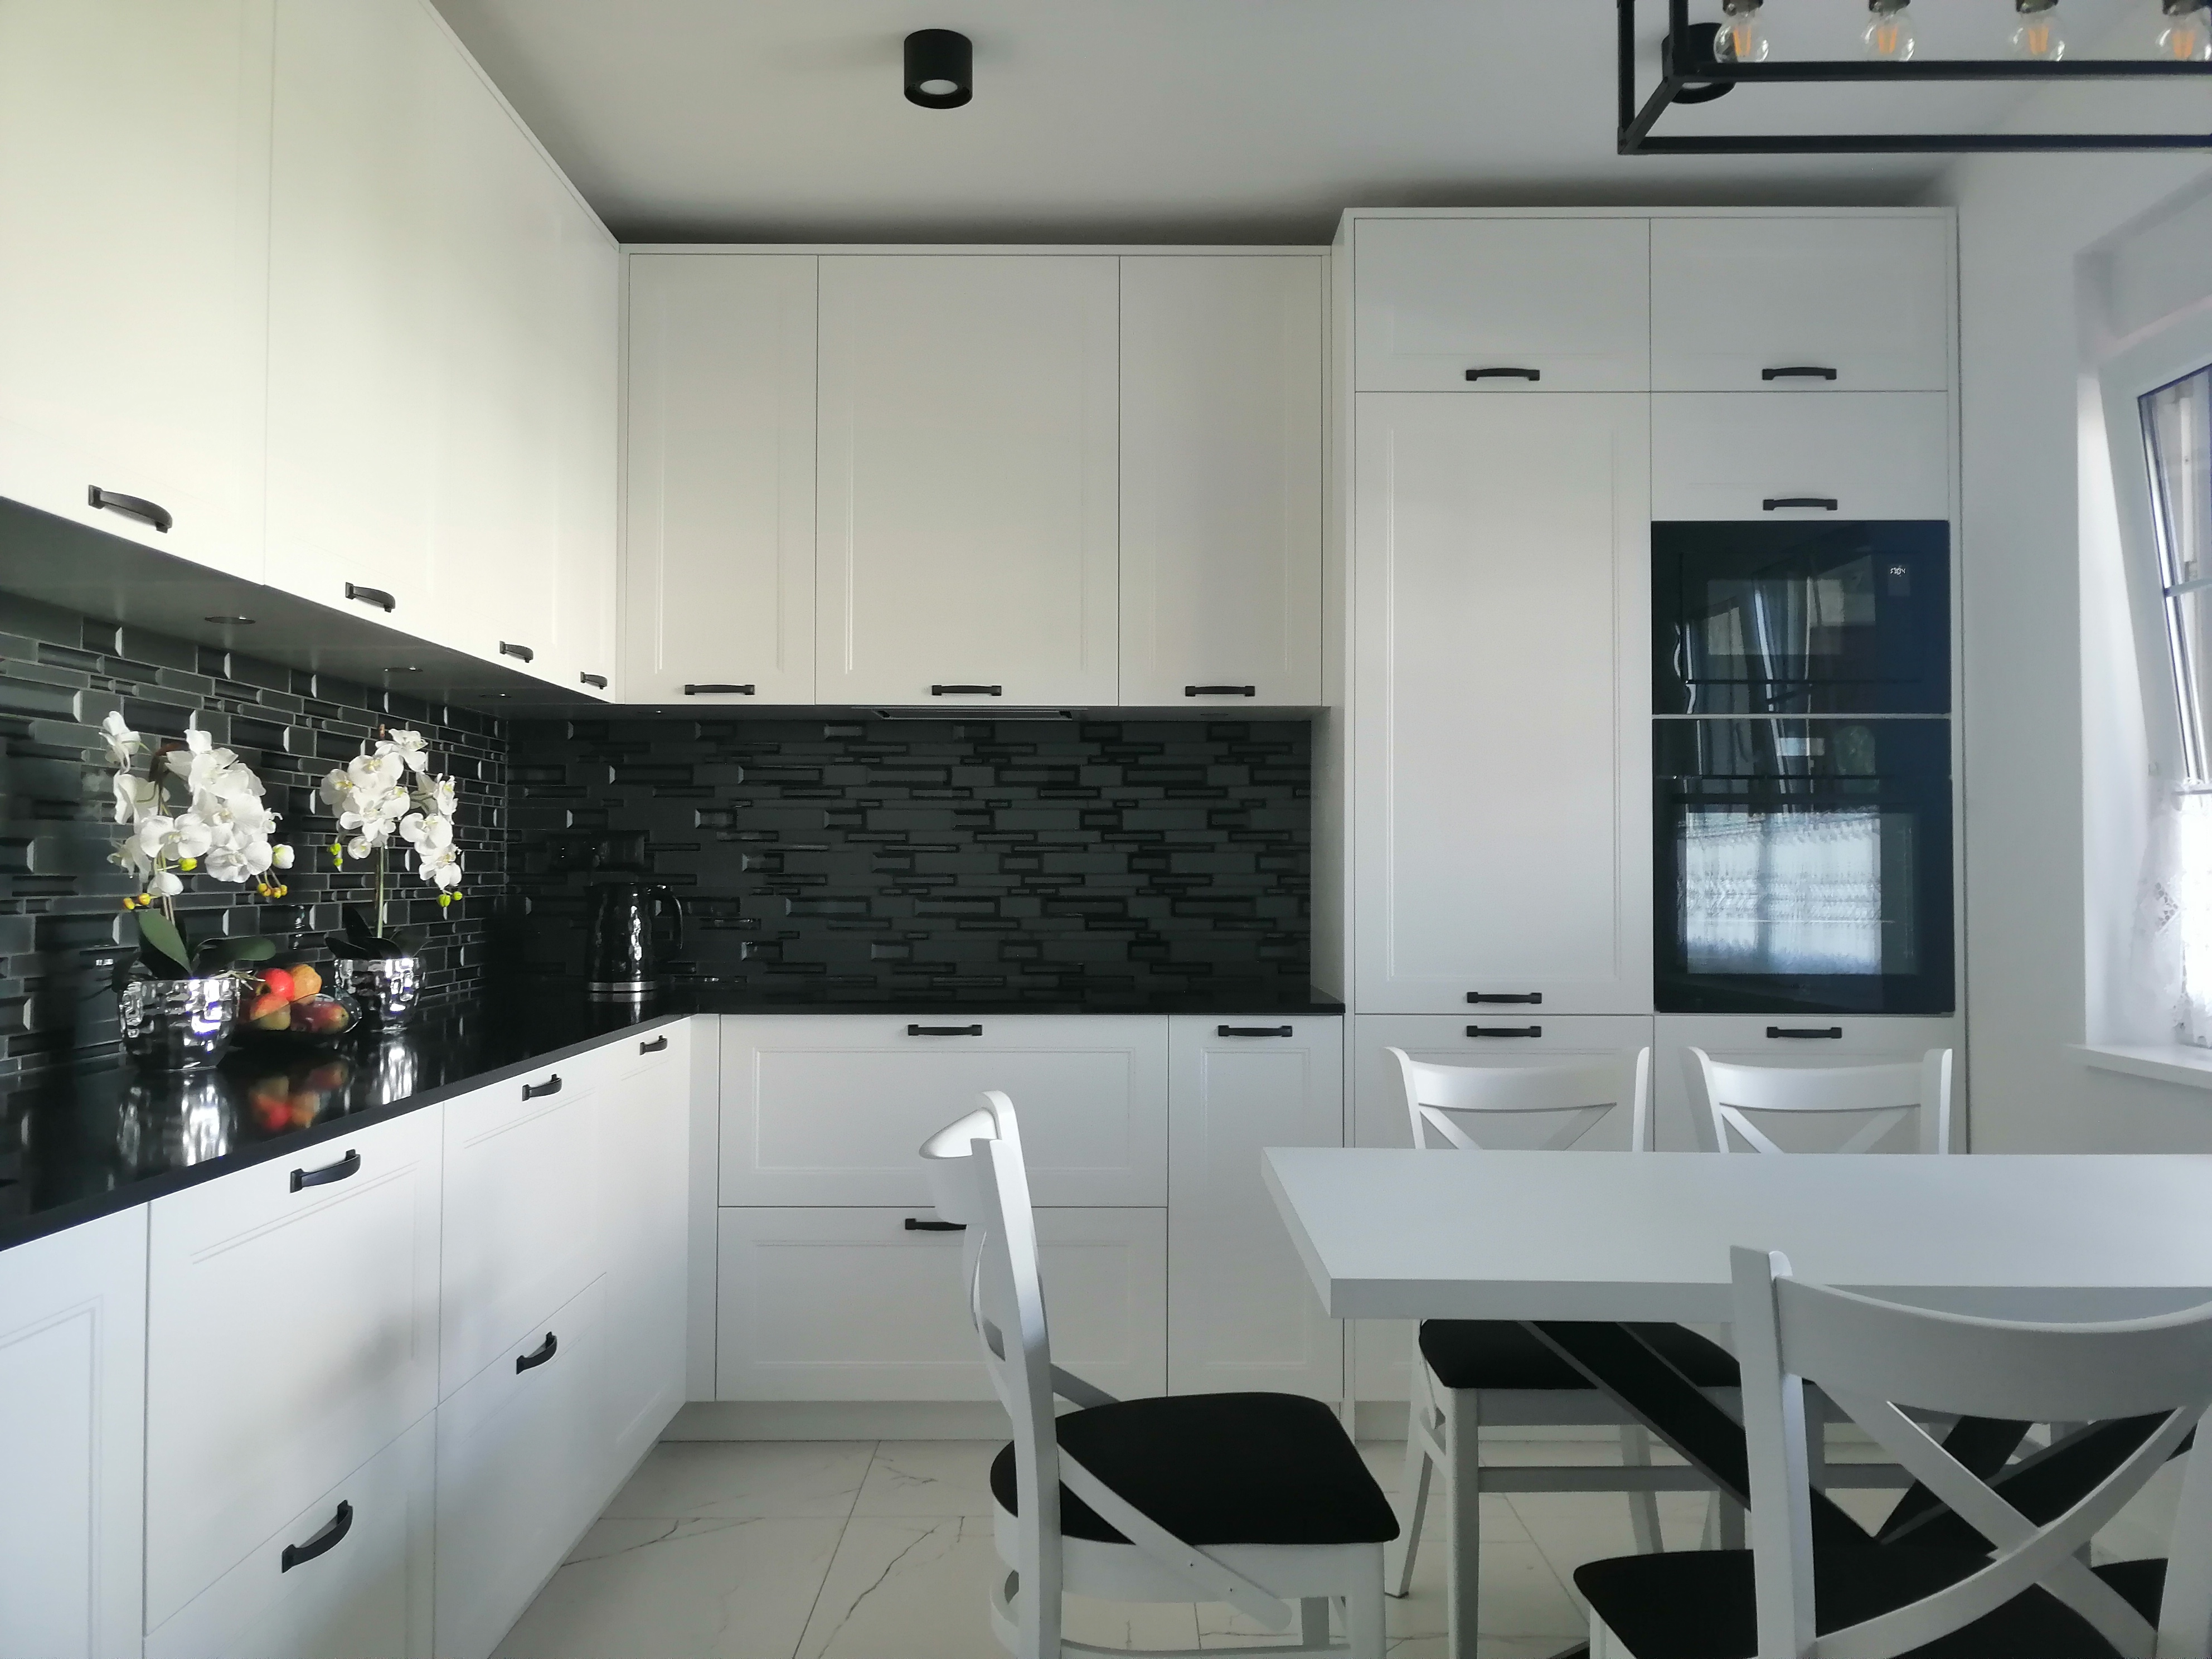 projekt kuchni, kuchnie na wymiar